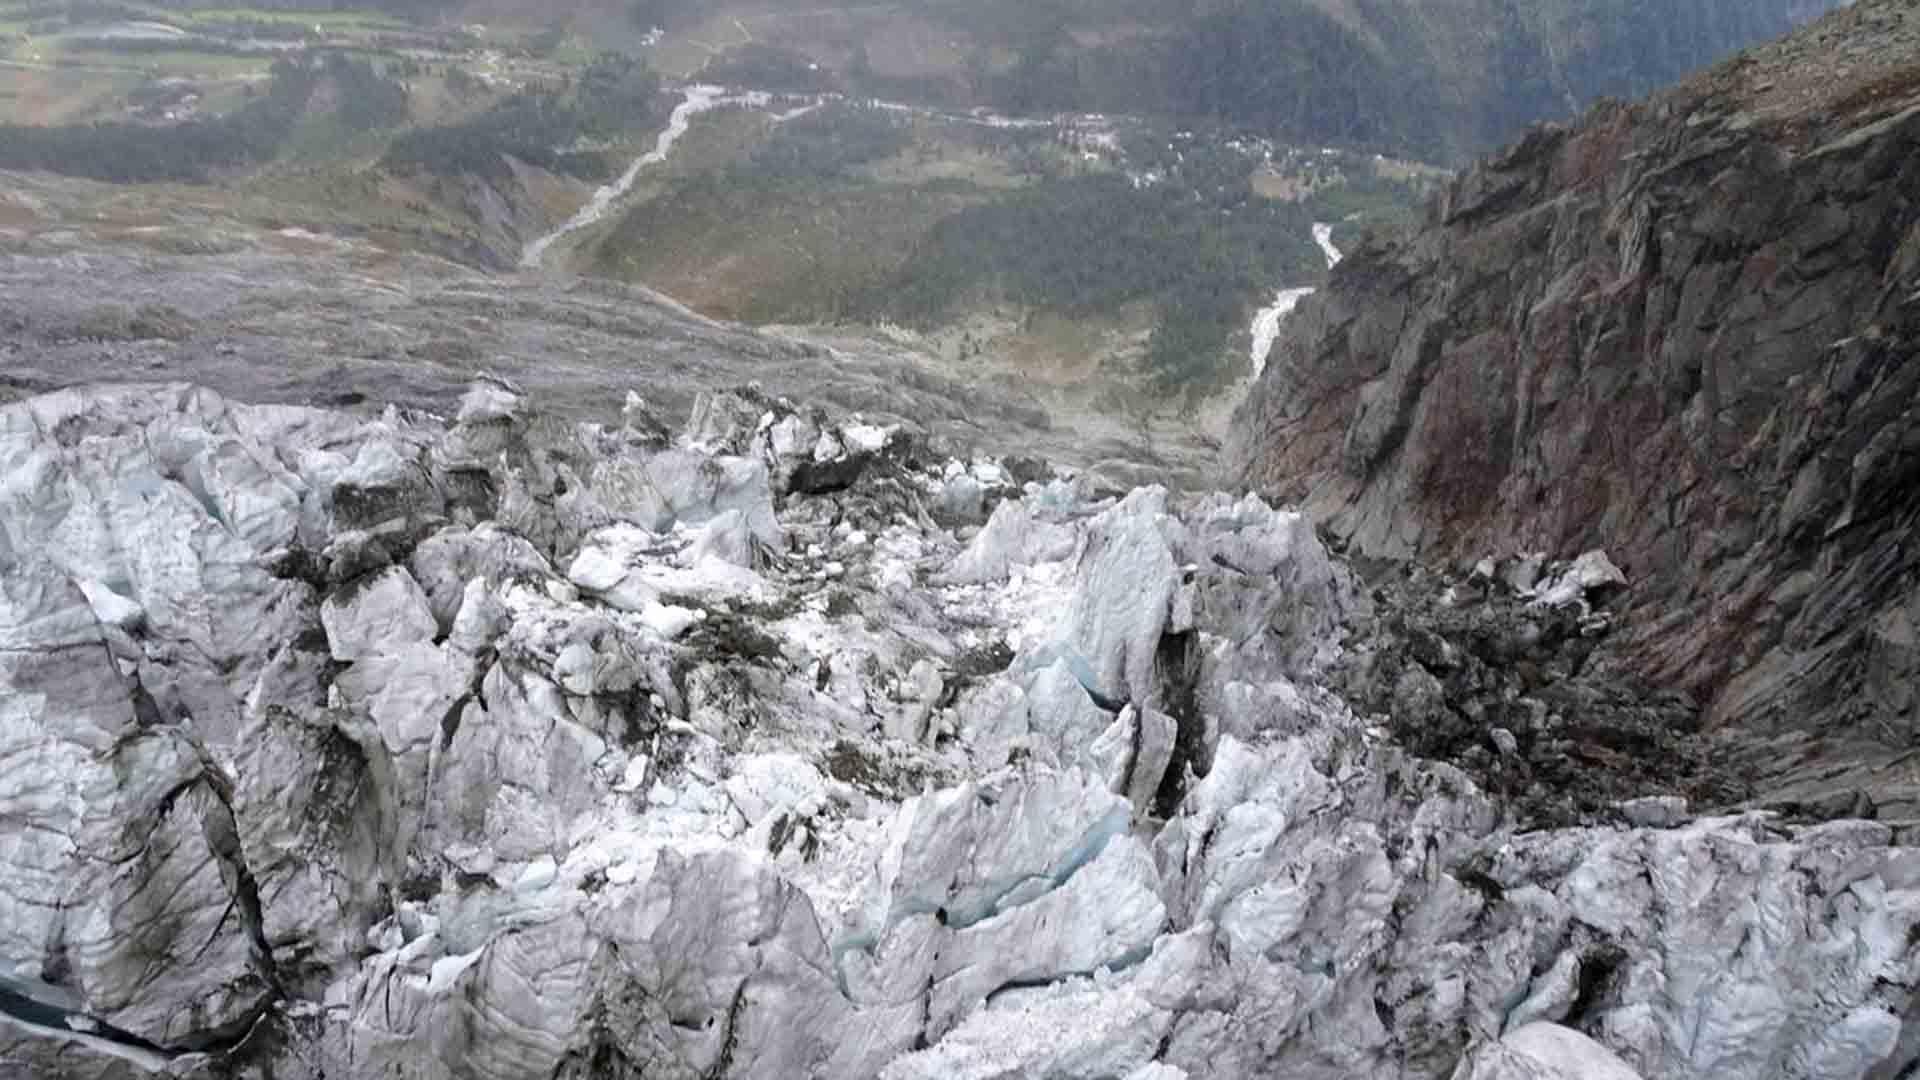 Il ghiacciaio Planpincieux sta cadendo